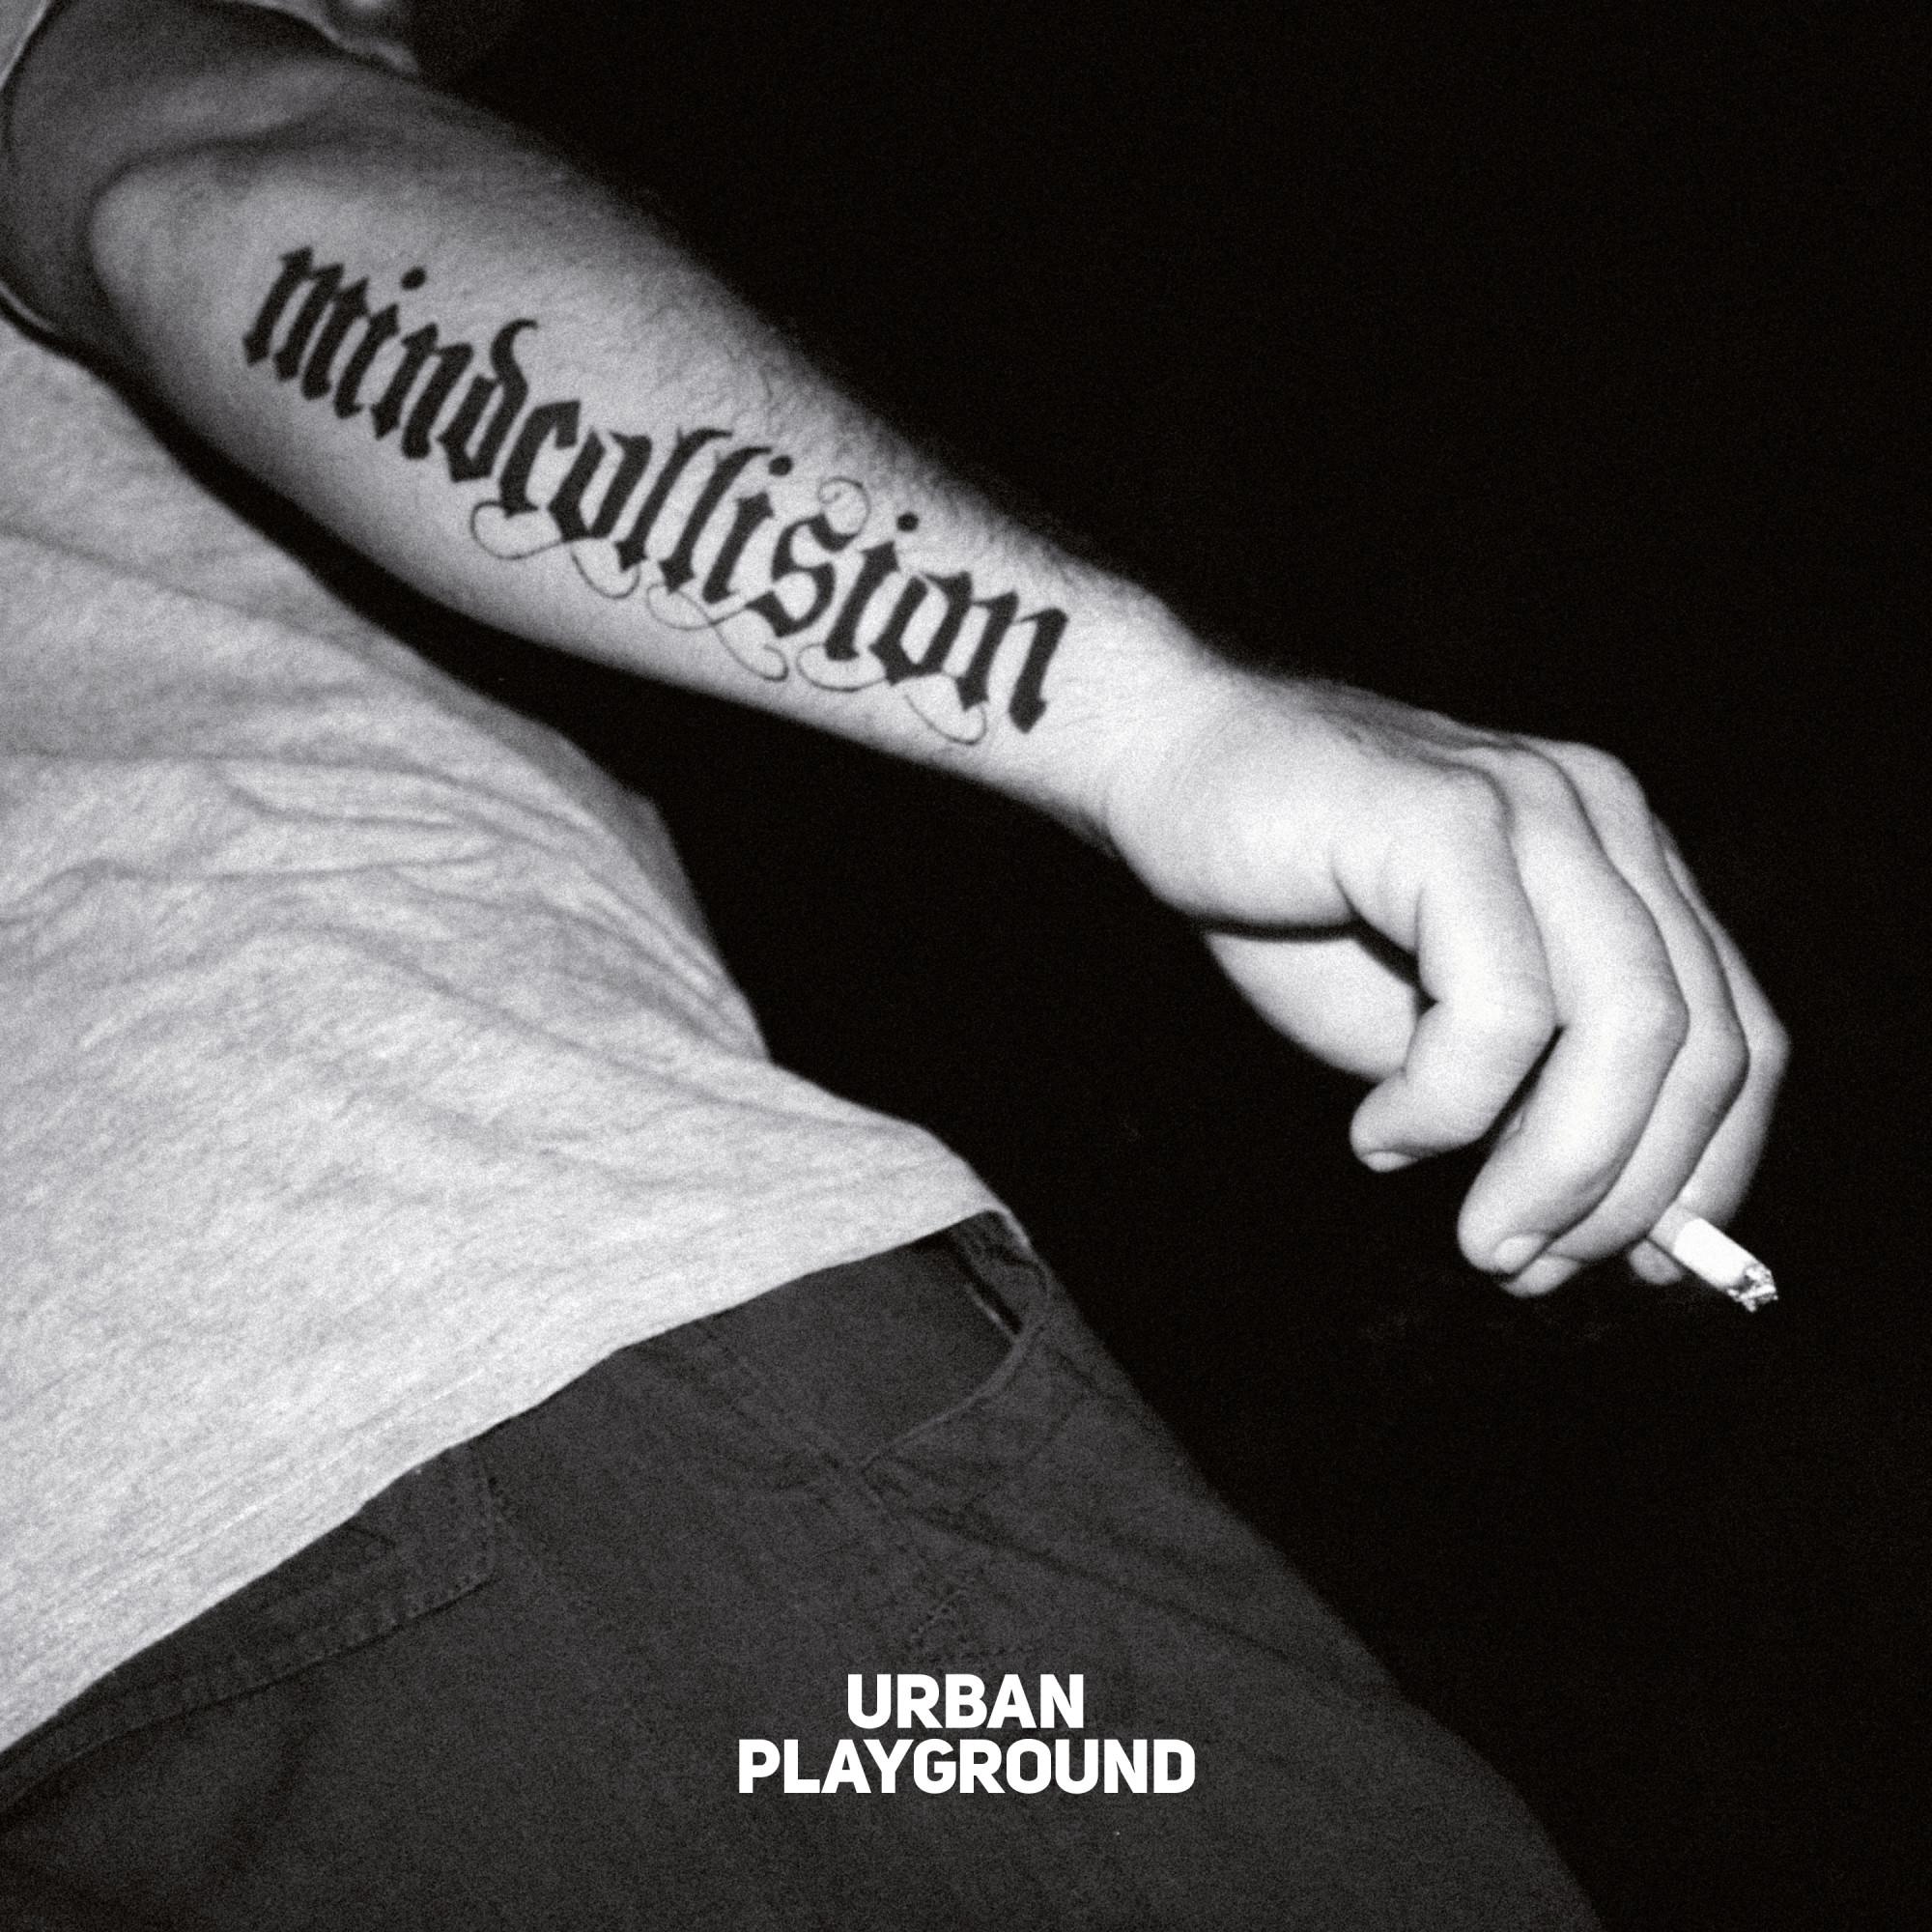 Mindcollision - Urban Playground - 2015